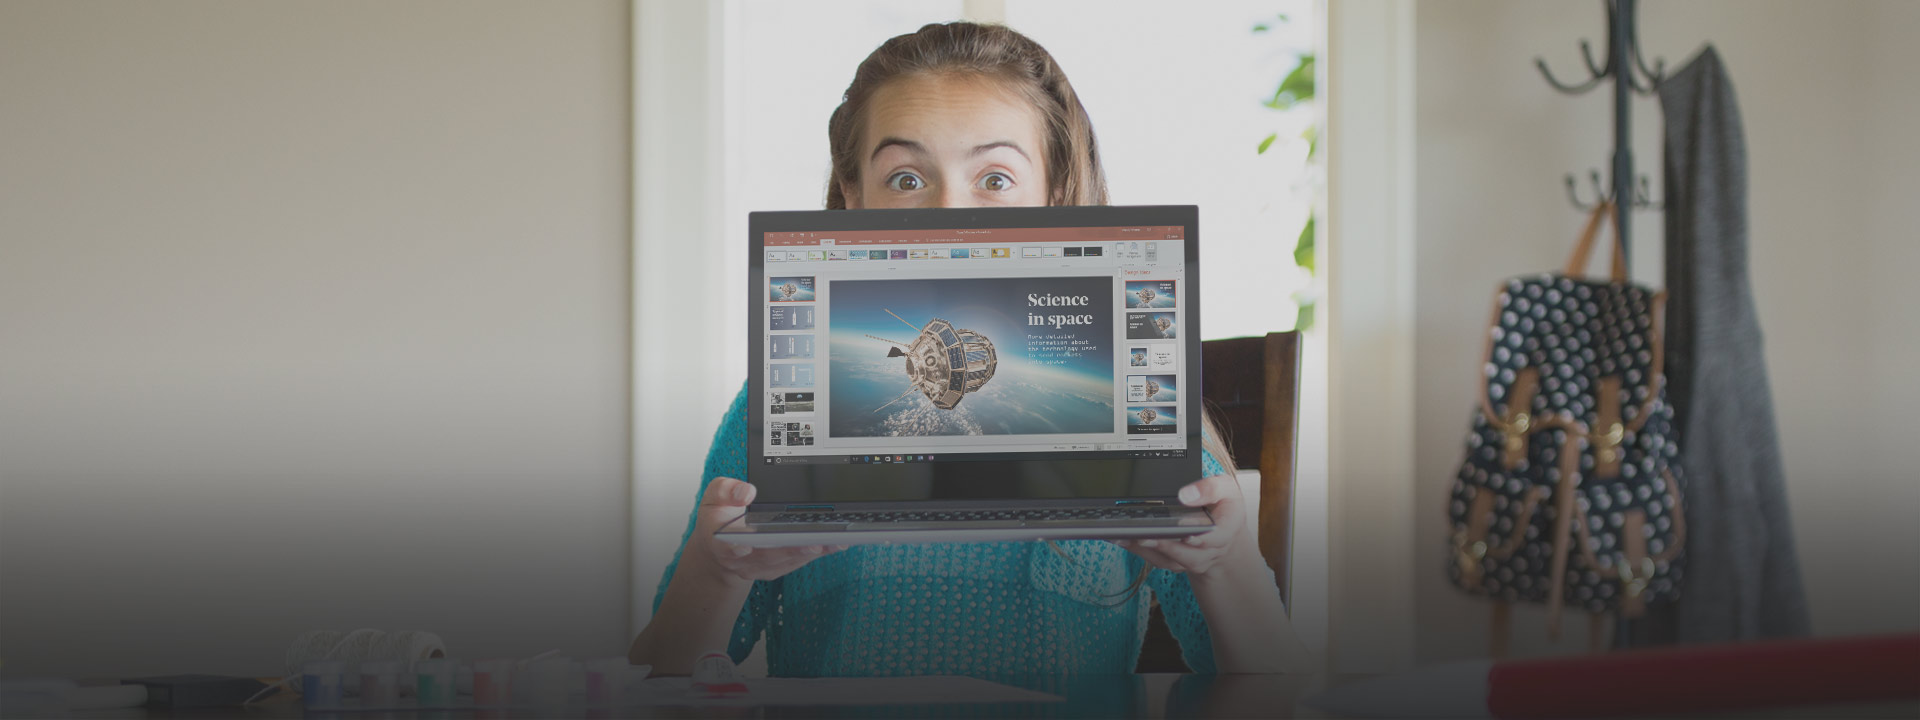 PC, obtén más información sobre Office 365